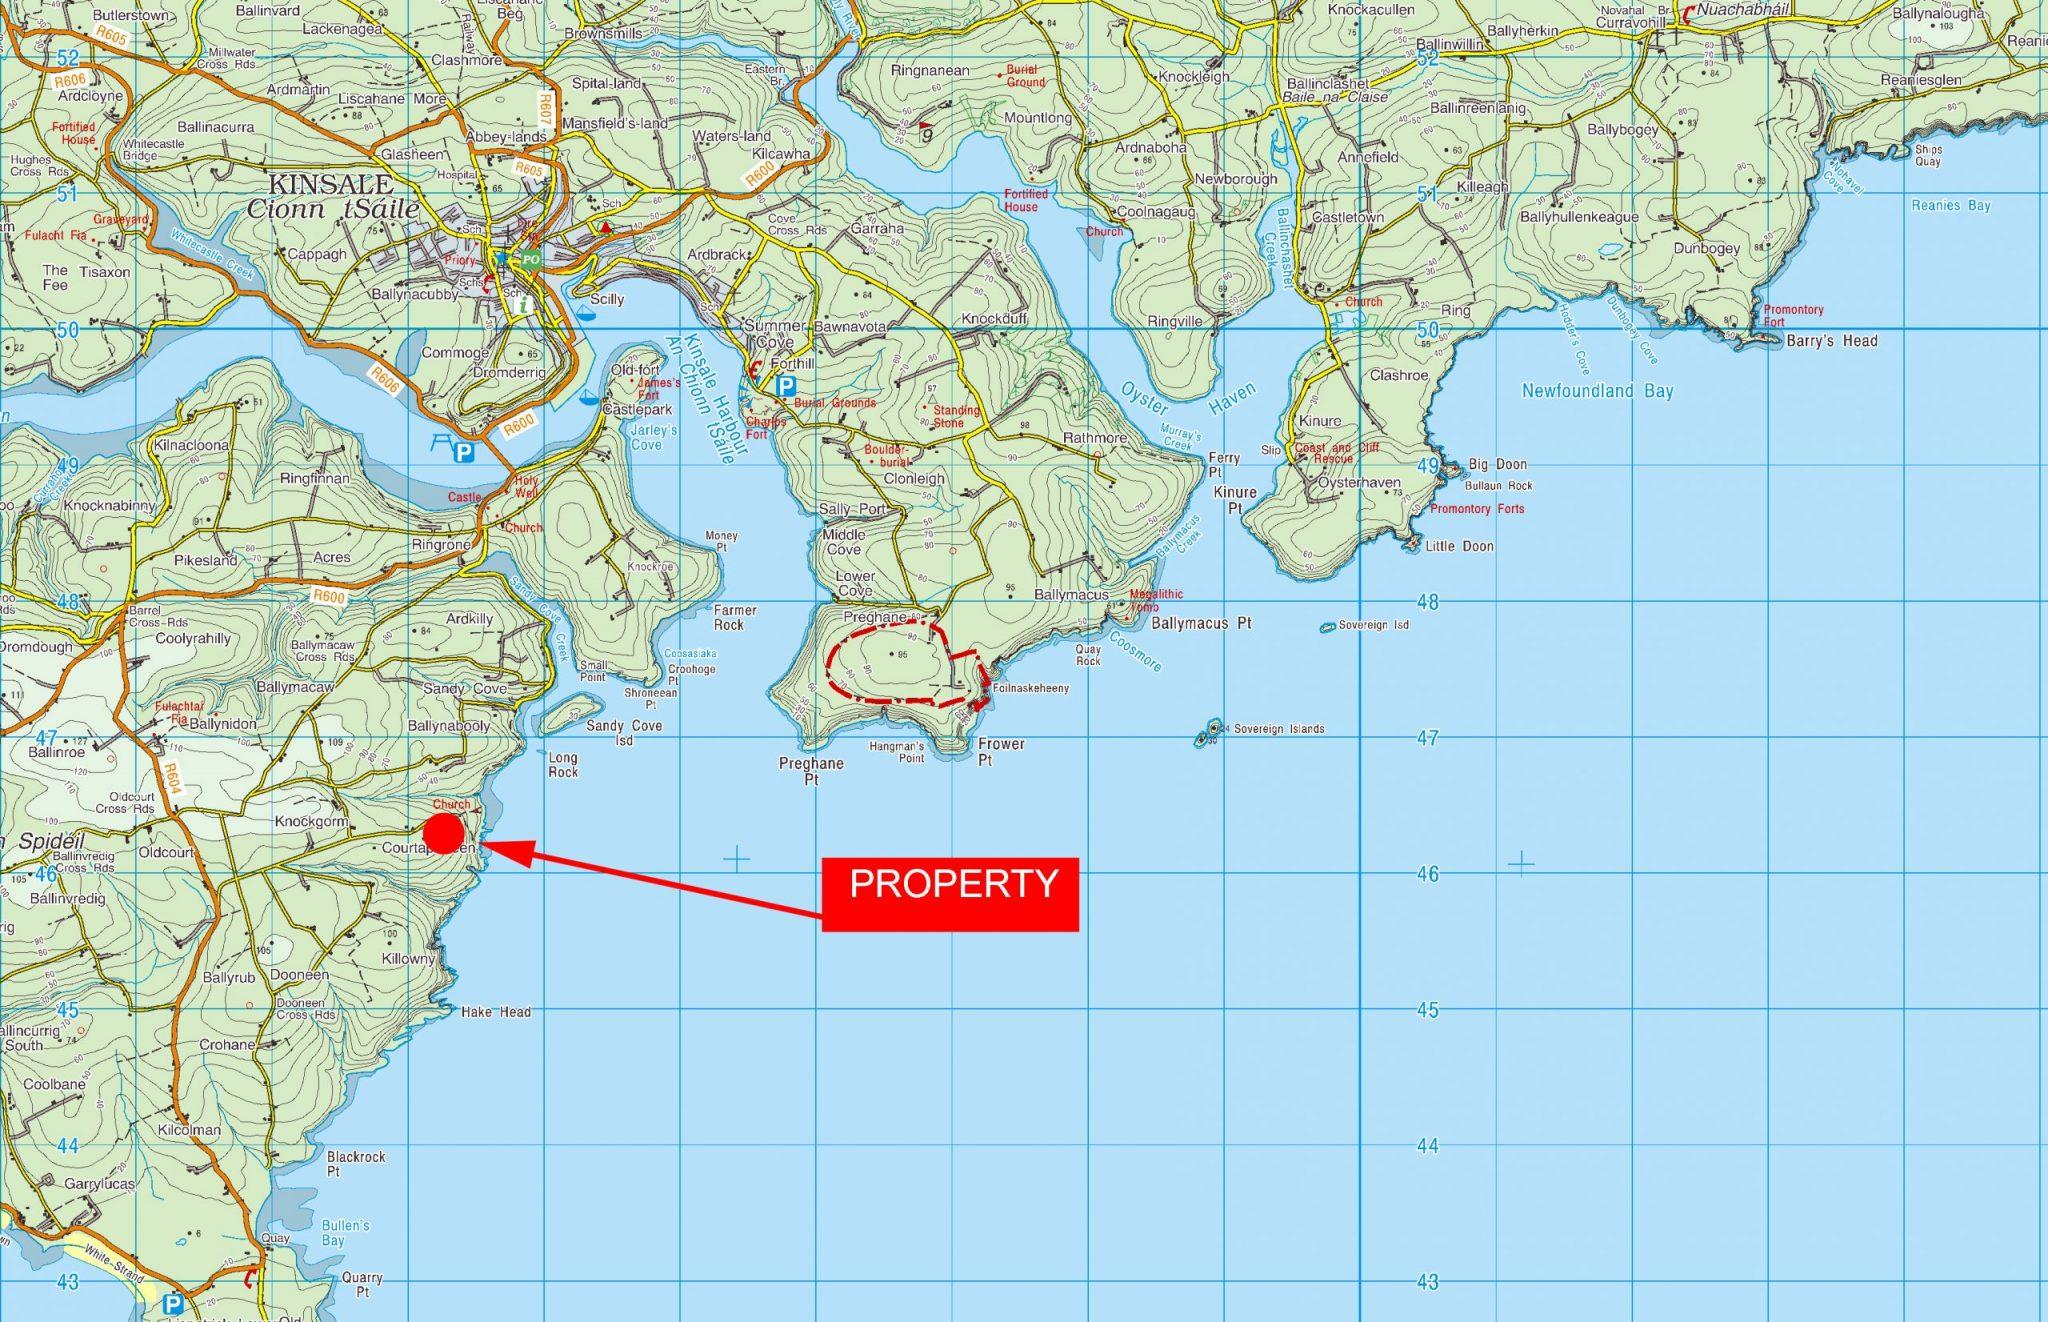 OS1604 LOCATION MAP